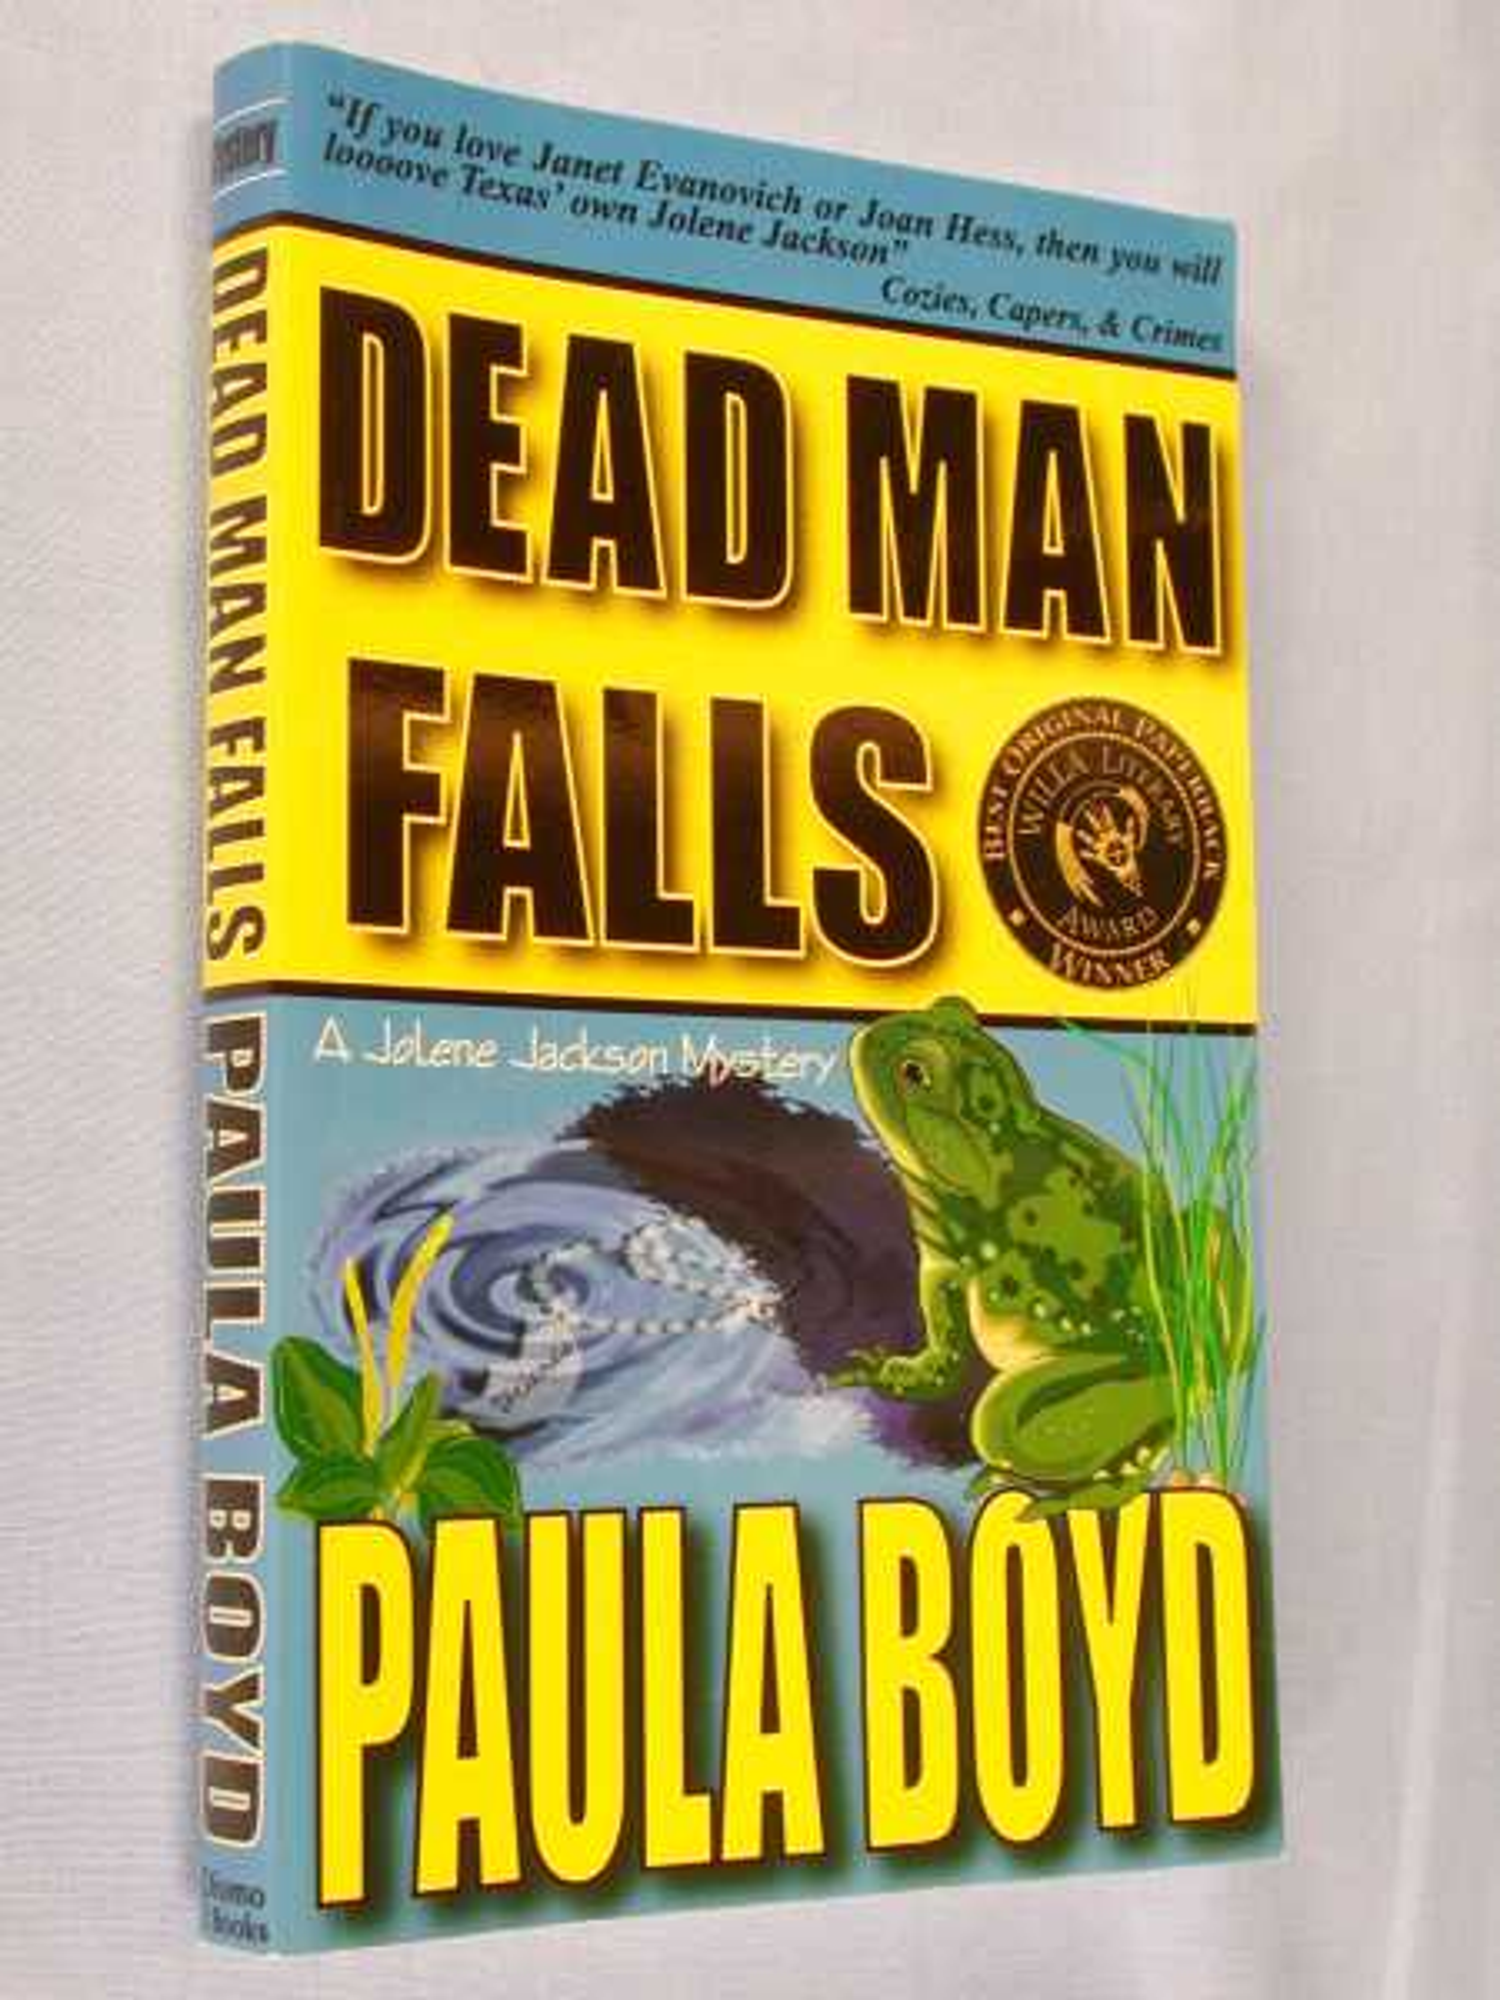 Dead Man Falls (Jolene Jackson Mystery Ser., Vol. 2), Boyd, Paula